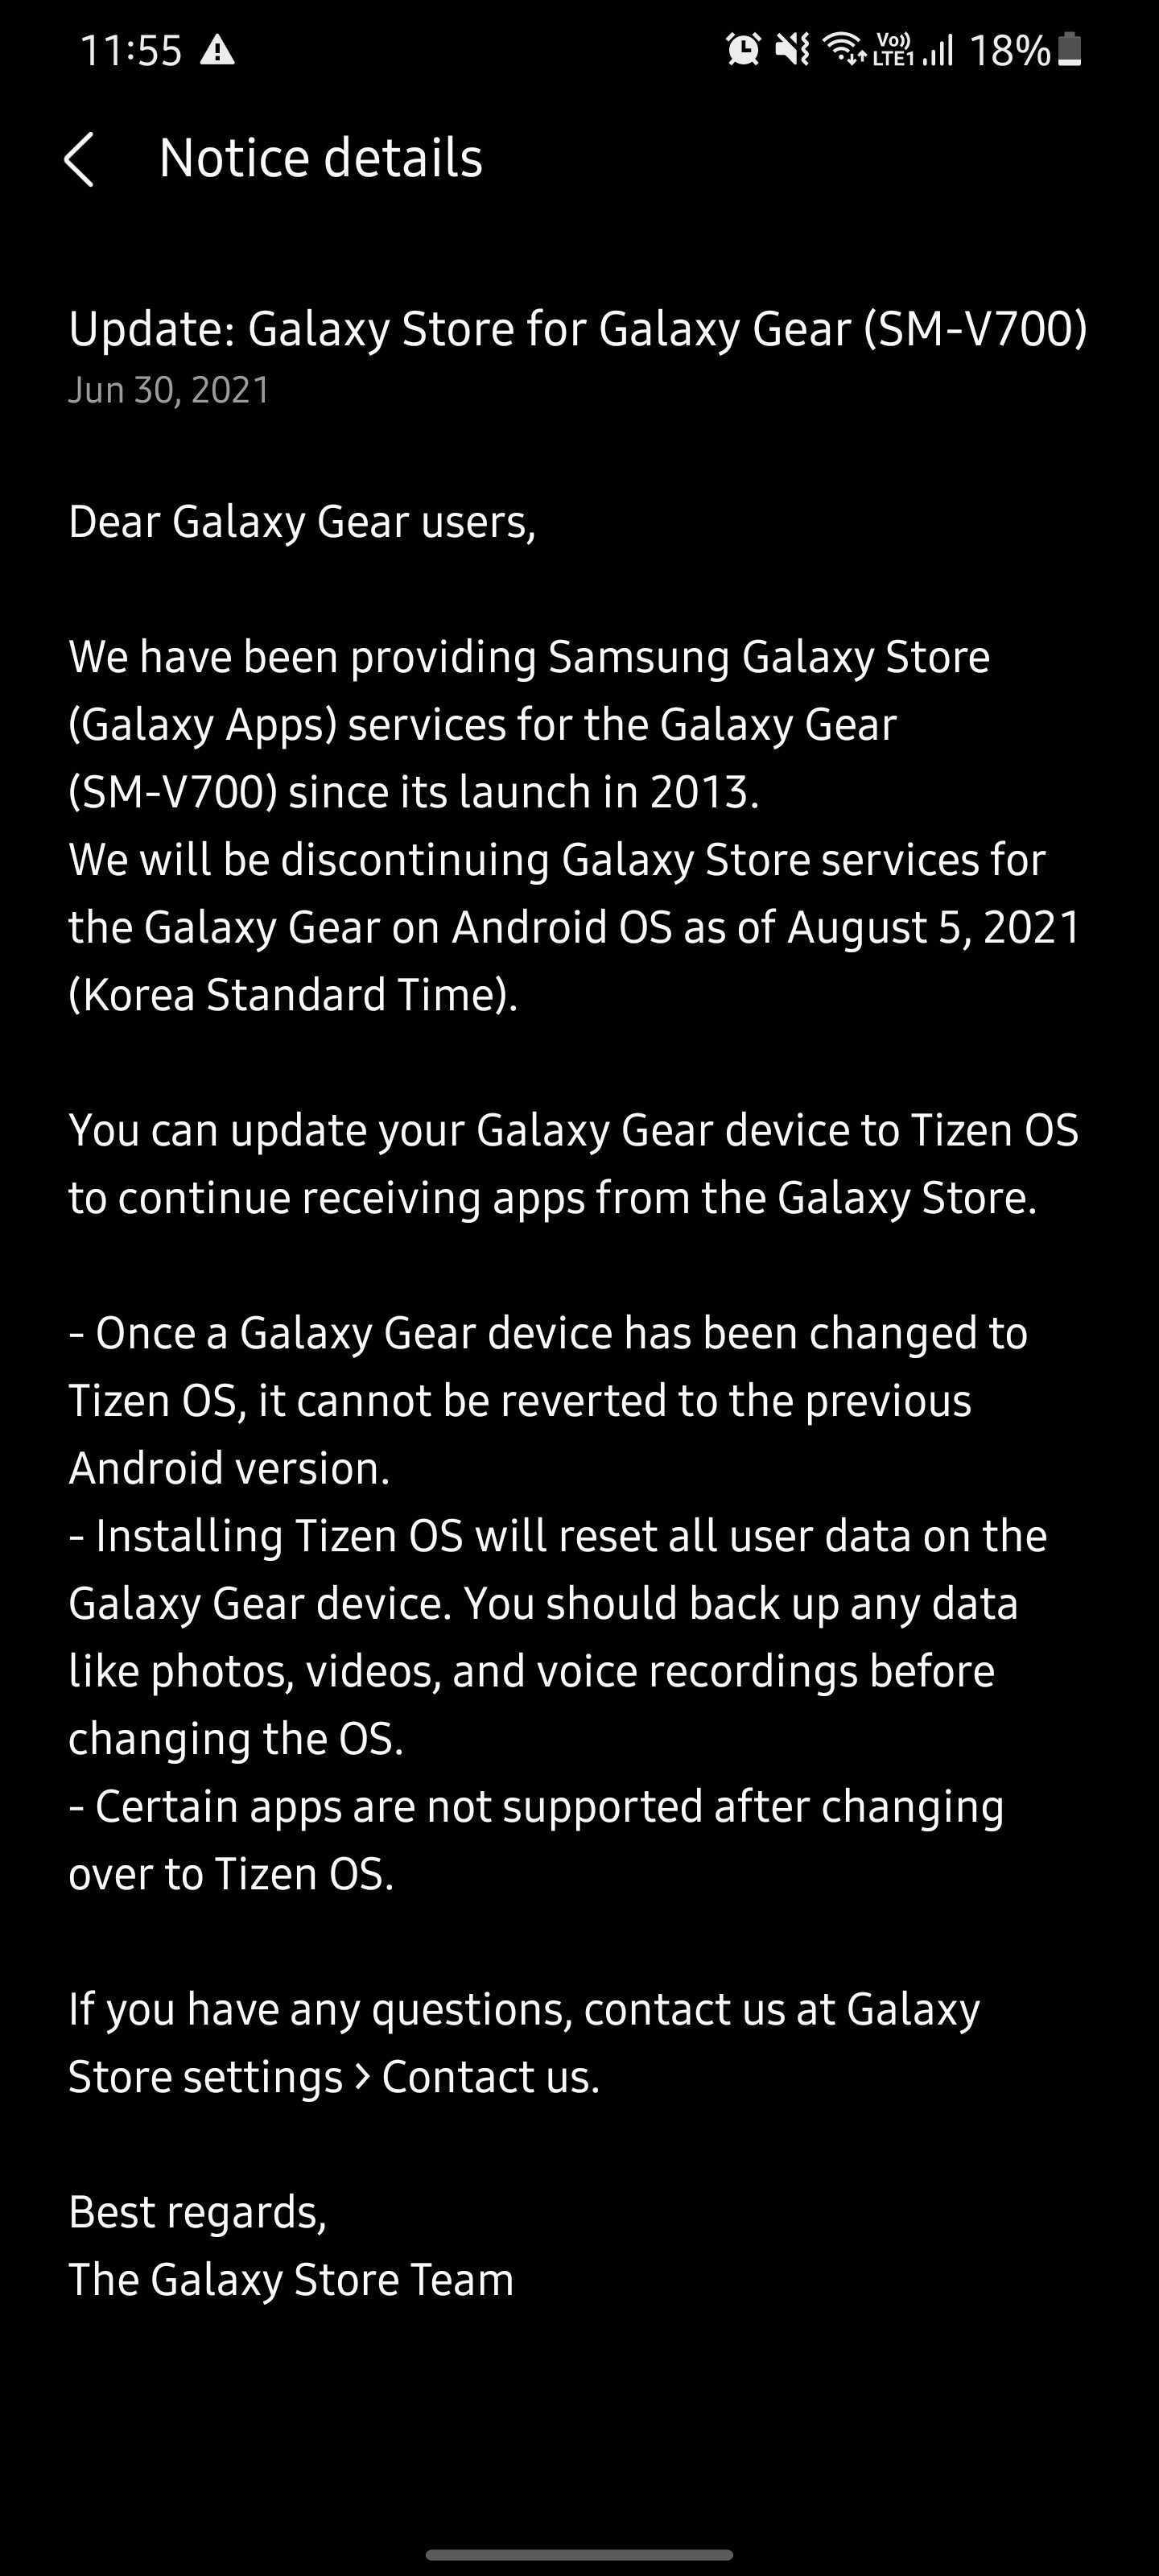 Samsung Galaxy Gear app support